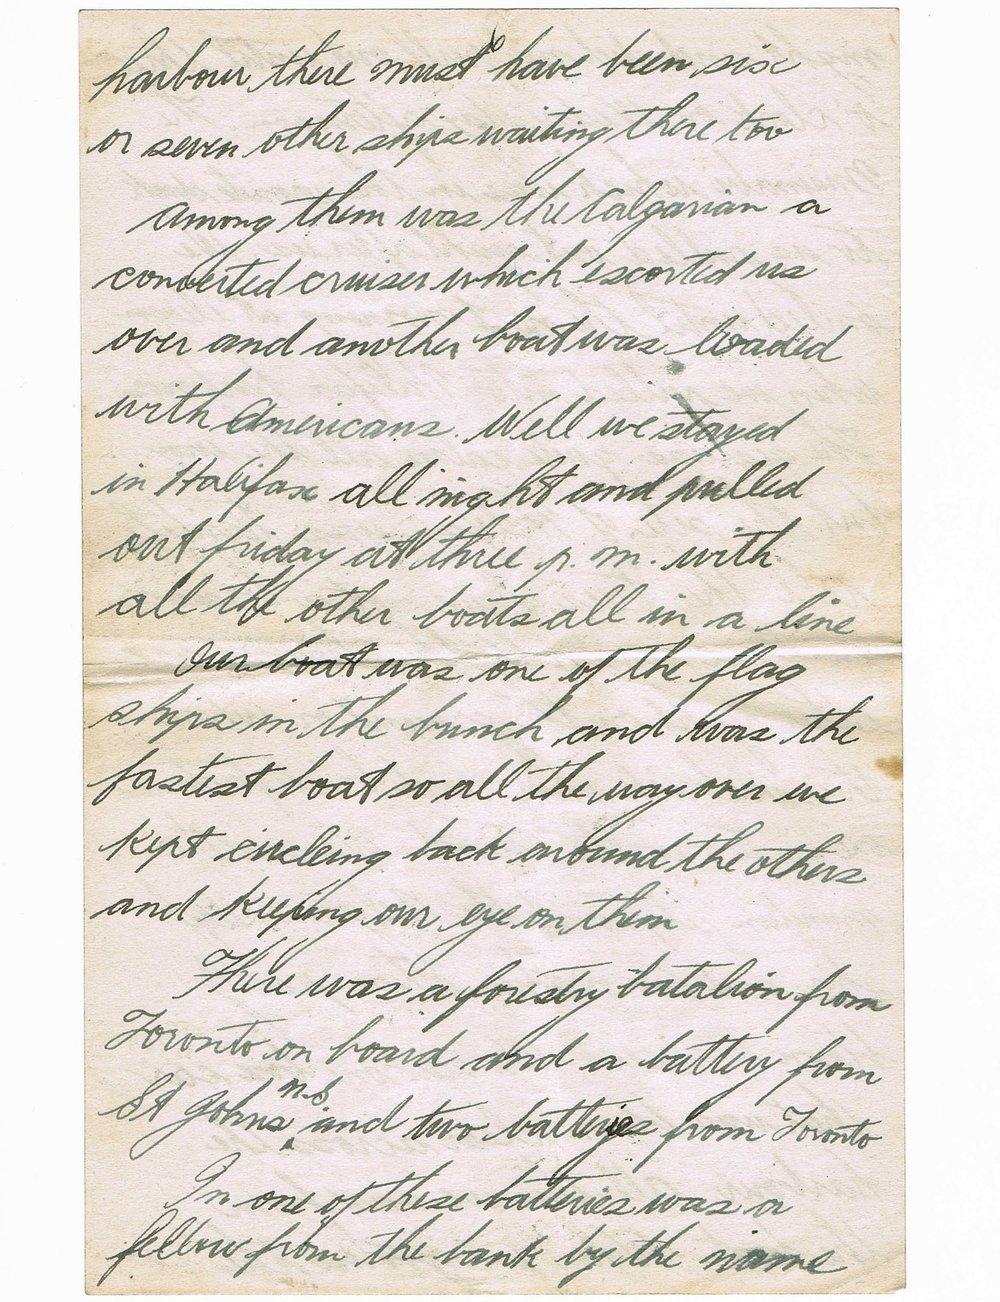 Basil Vale January 2, 1918 letter - page 6.jpg